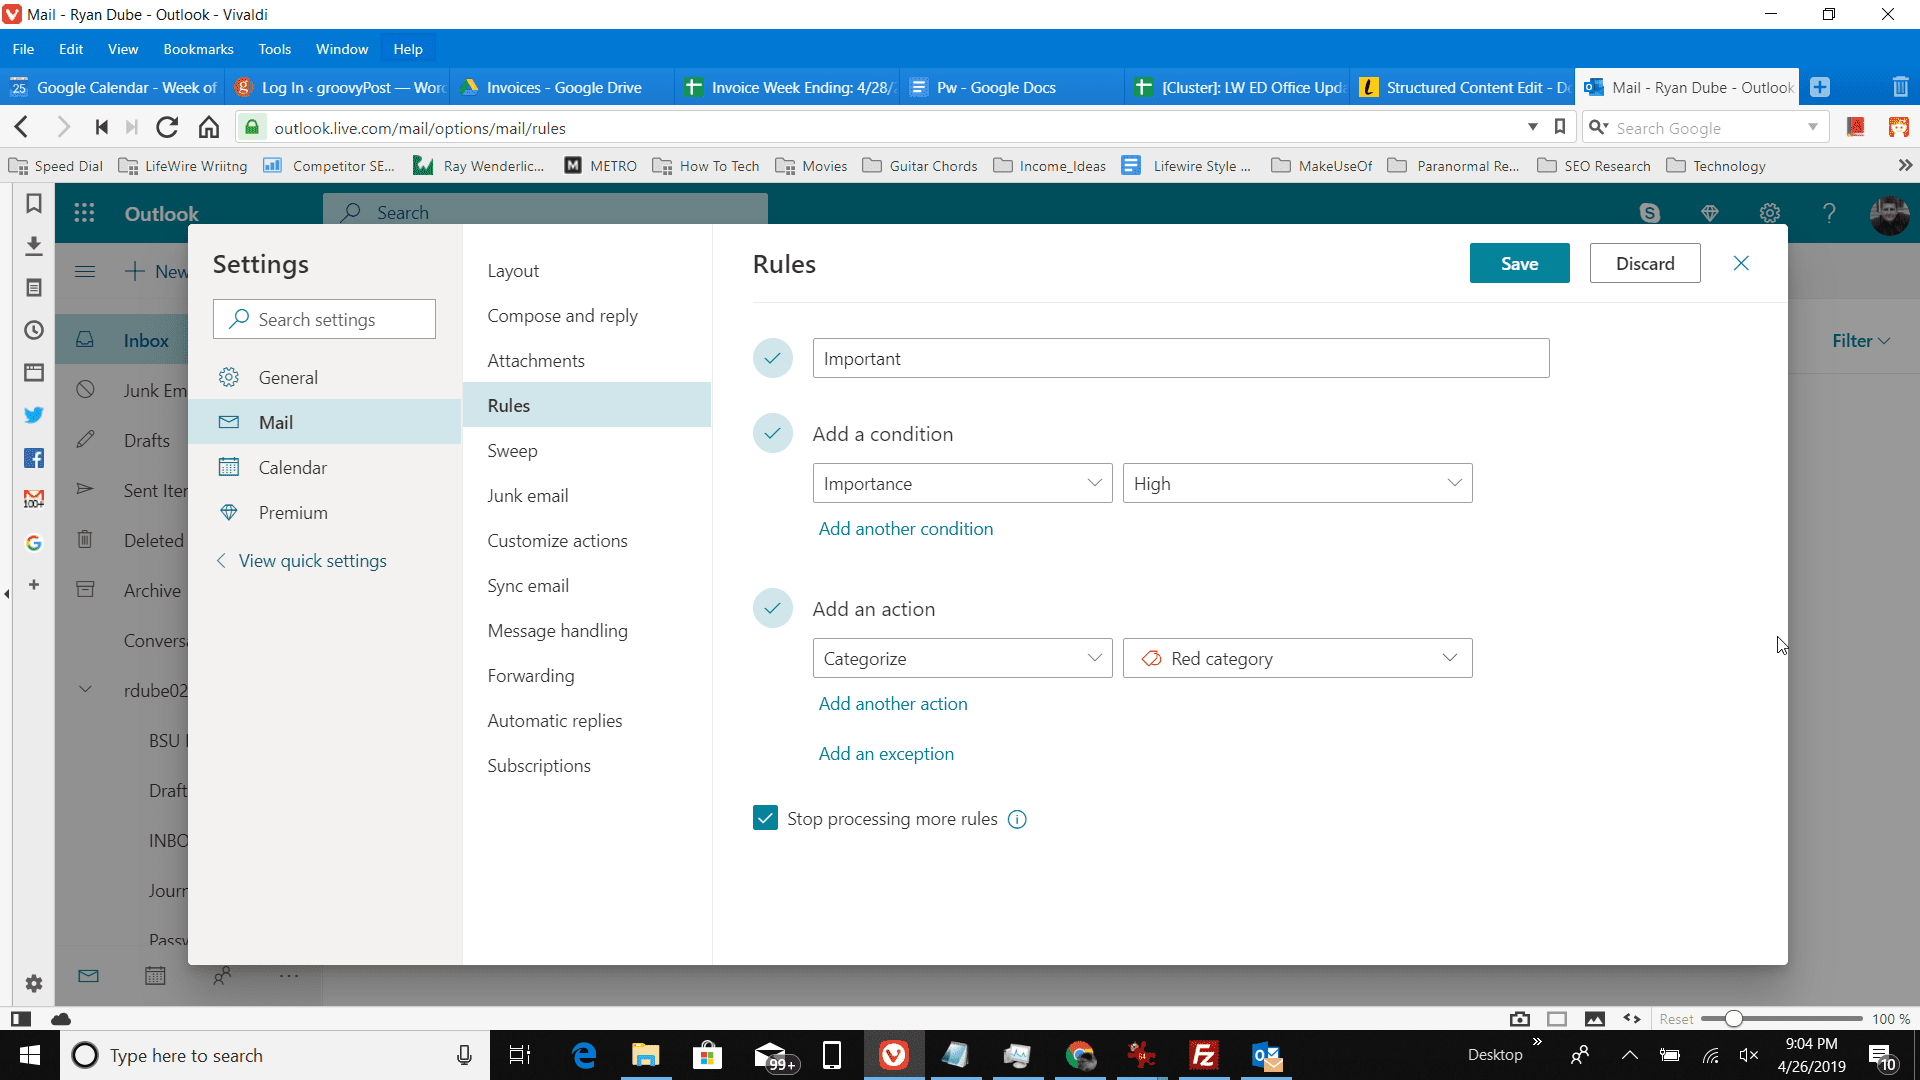 Screenshot of the Rules menu in Outlook.com